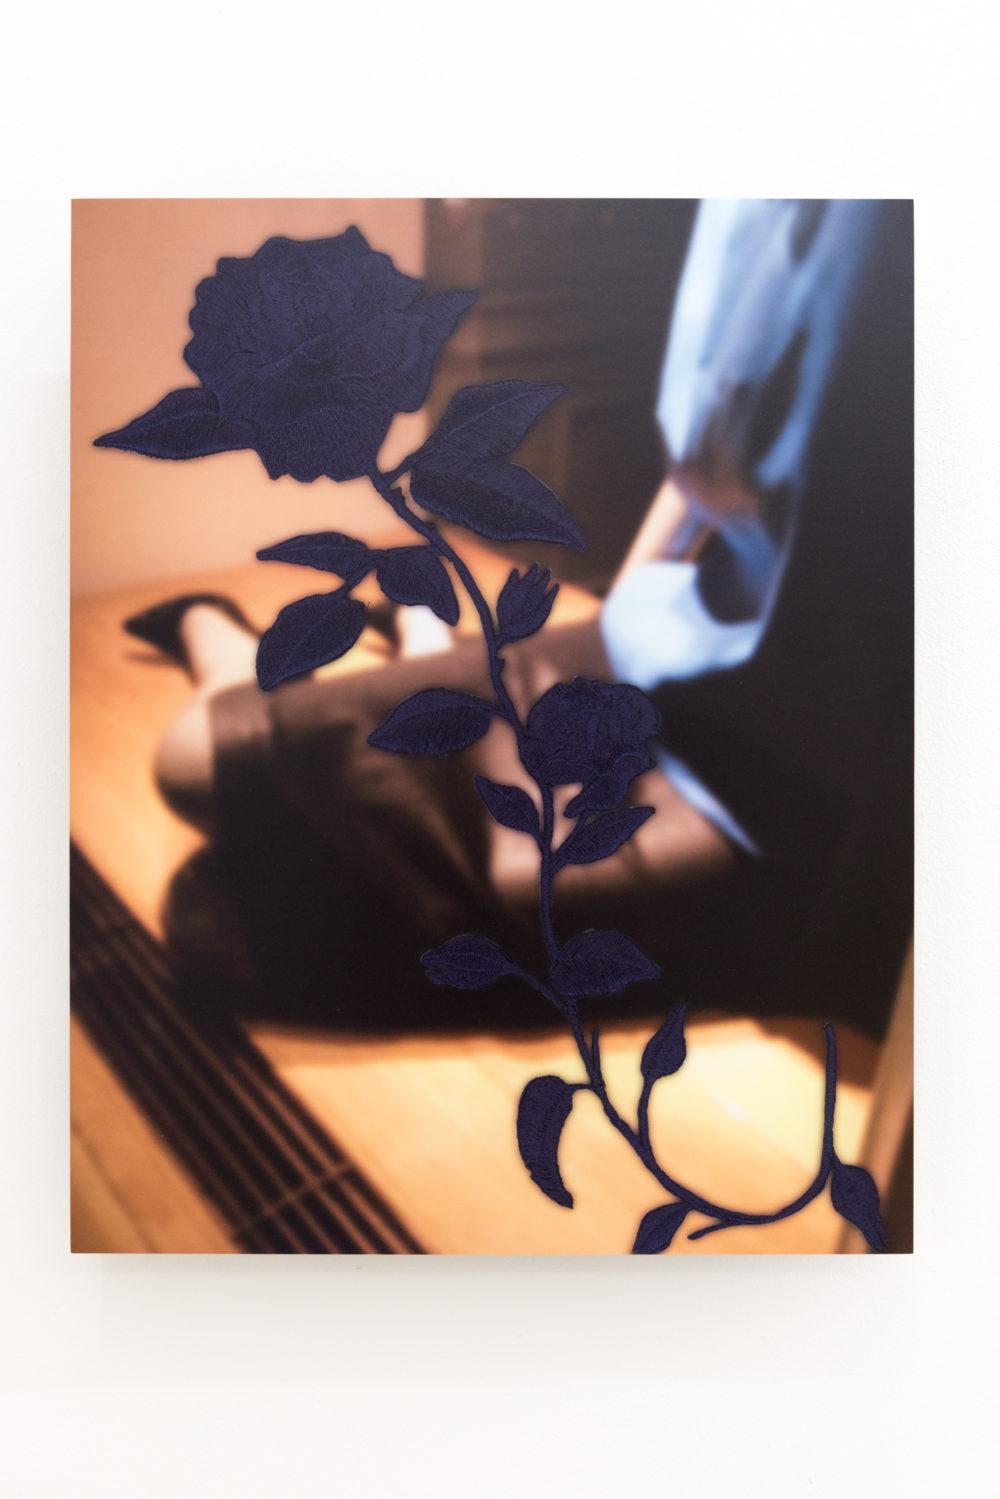 Dena Yago In a Future April, 2016 Digital C-print mounted on aluminum Edition of 3